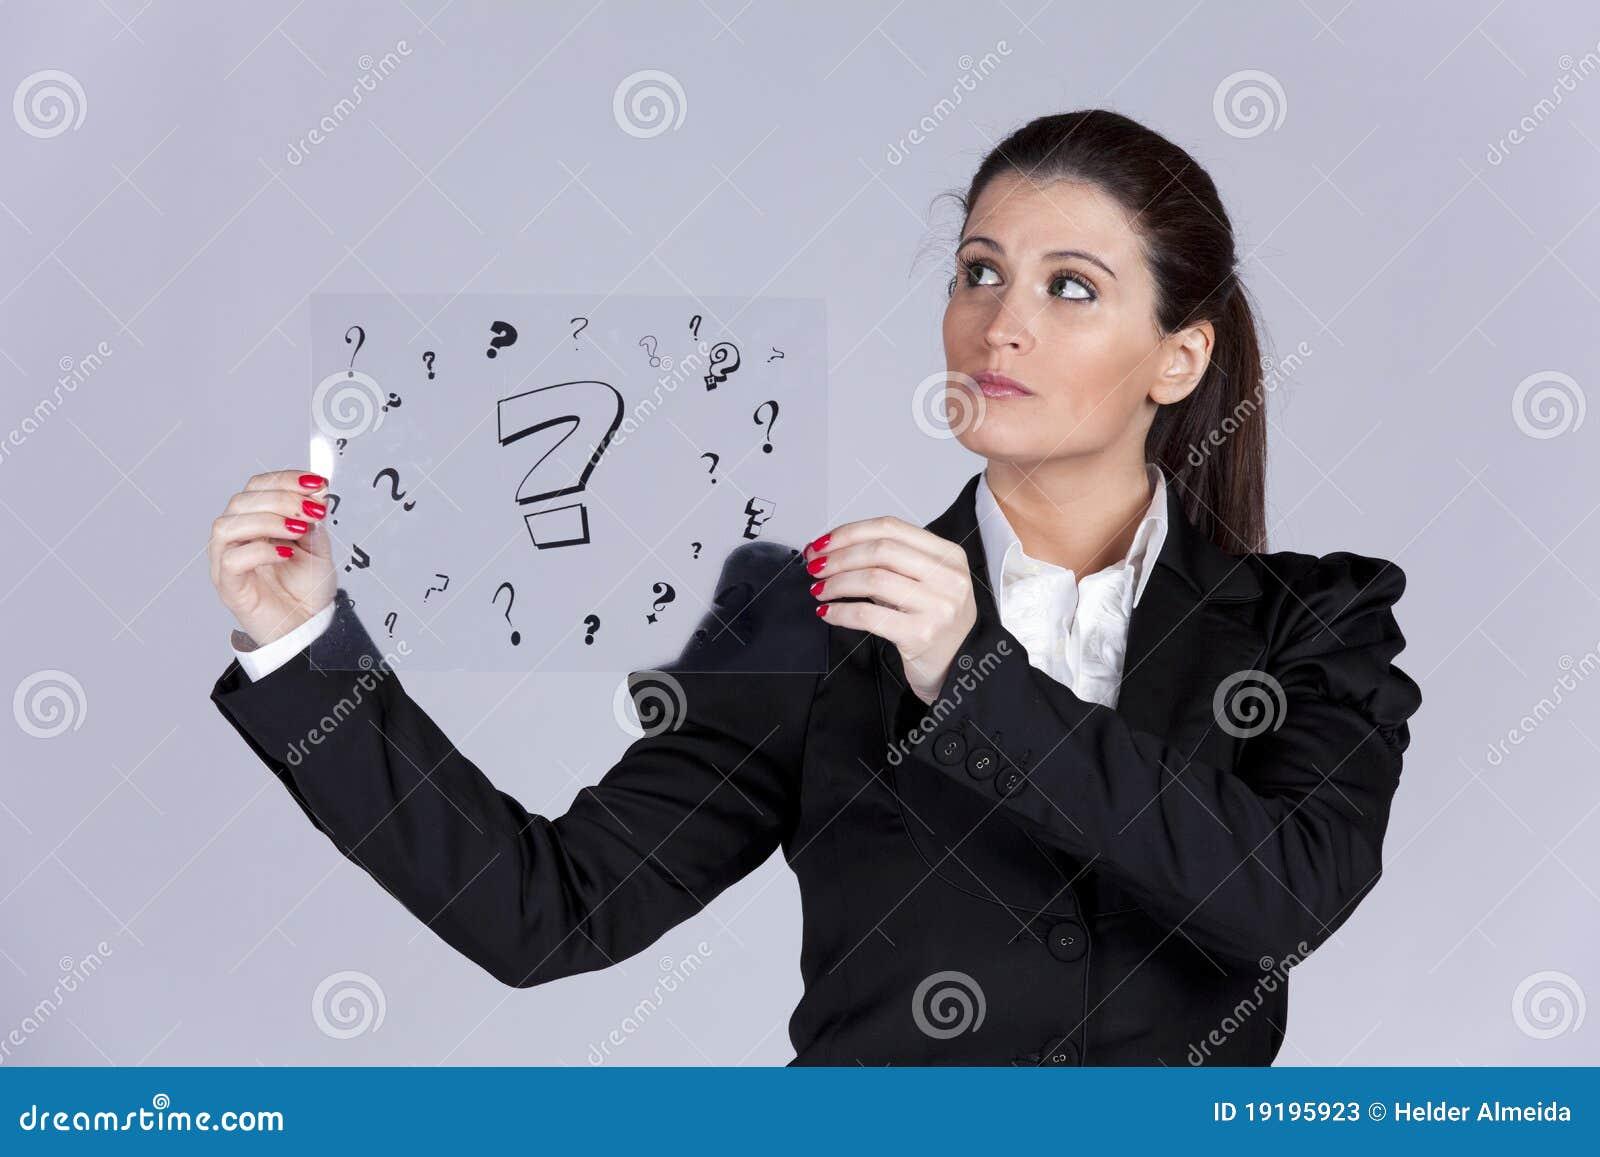 Businesswoman questions